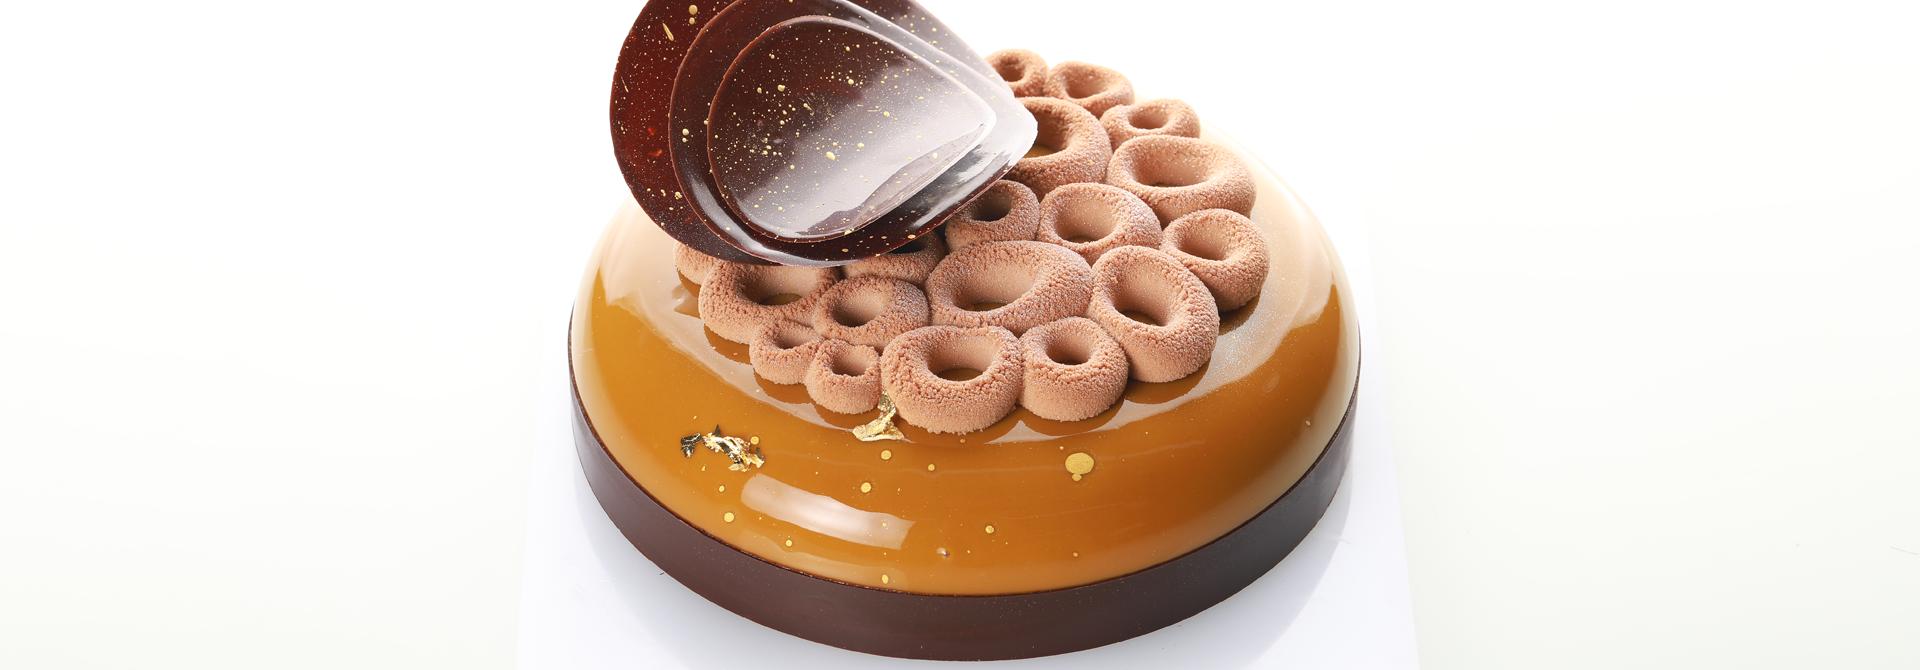 Praline and Chocolate entremet